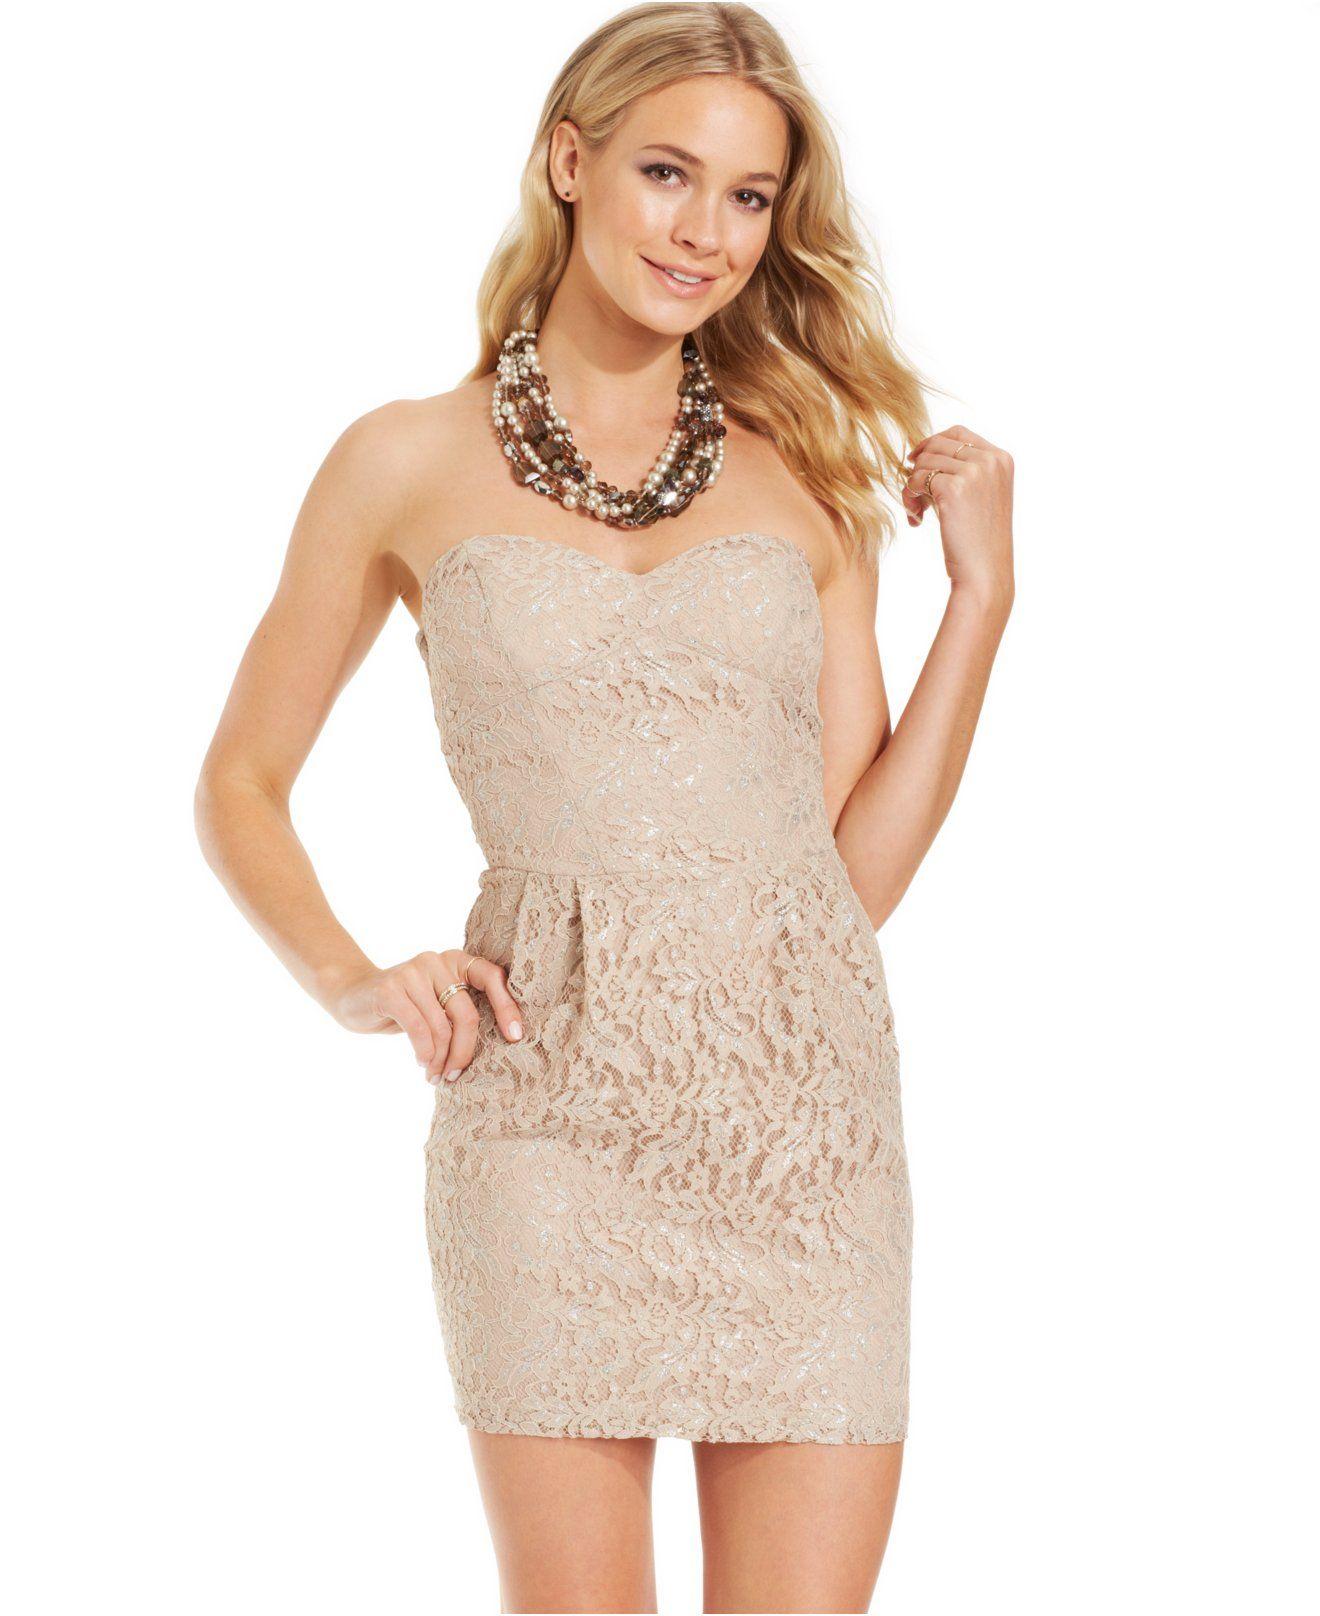 B darlin juniors lace metallic dress bachelorette party